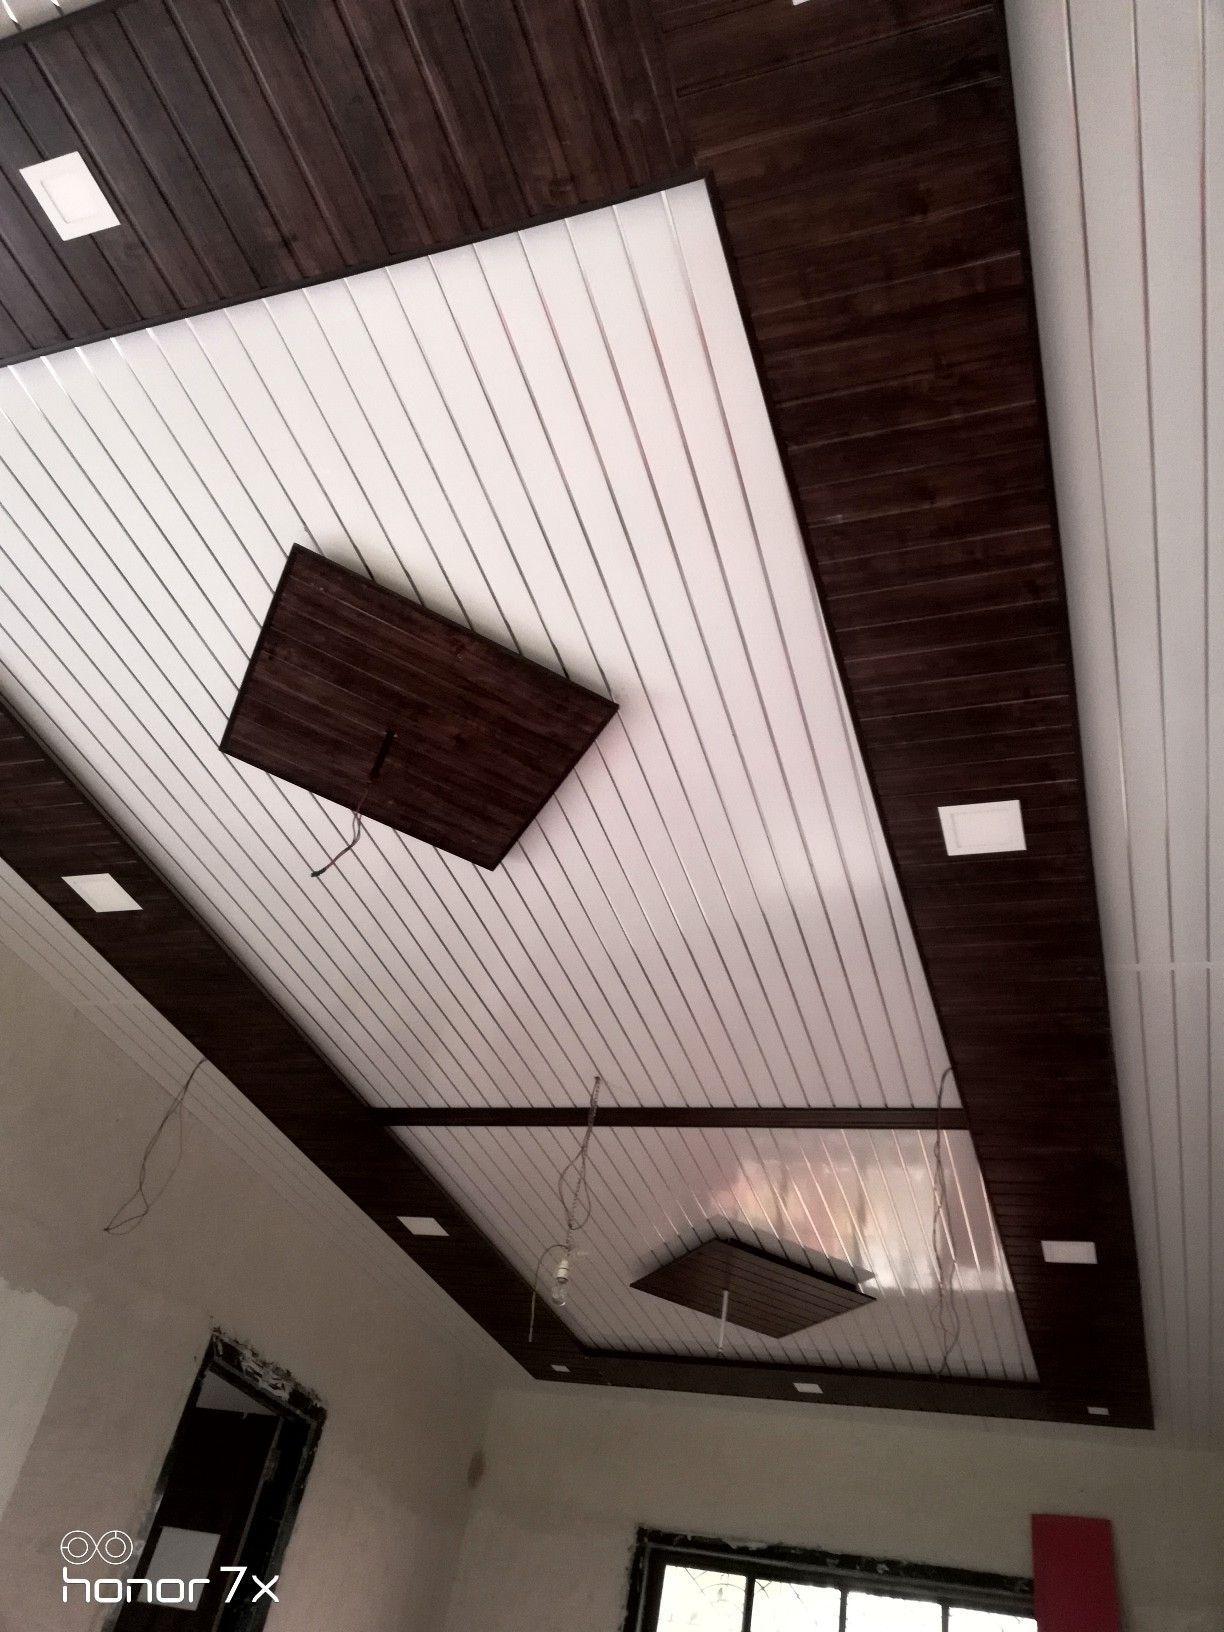 Forro De Pvc Plafon Forro De Pvc Plafon Forro Plafon Pvc Pvc Ceiling Design Ceiling Design Pvc Ceiling Popular bedroom pvc ceiling